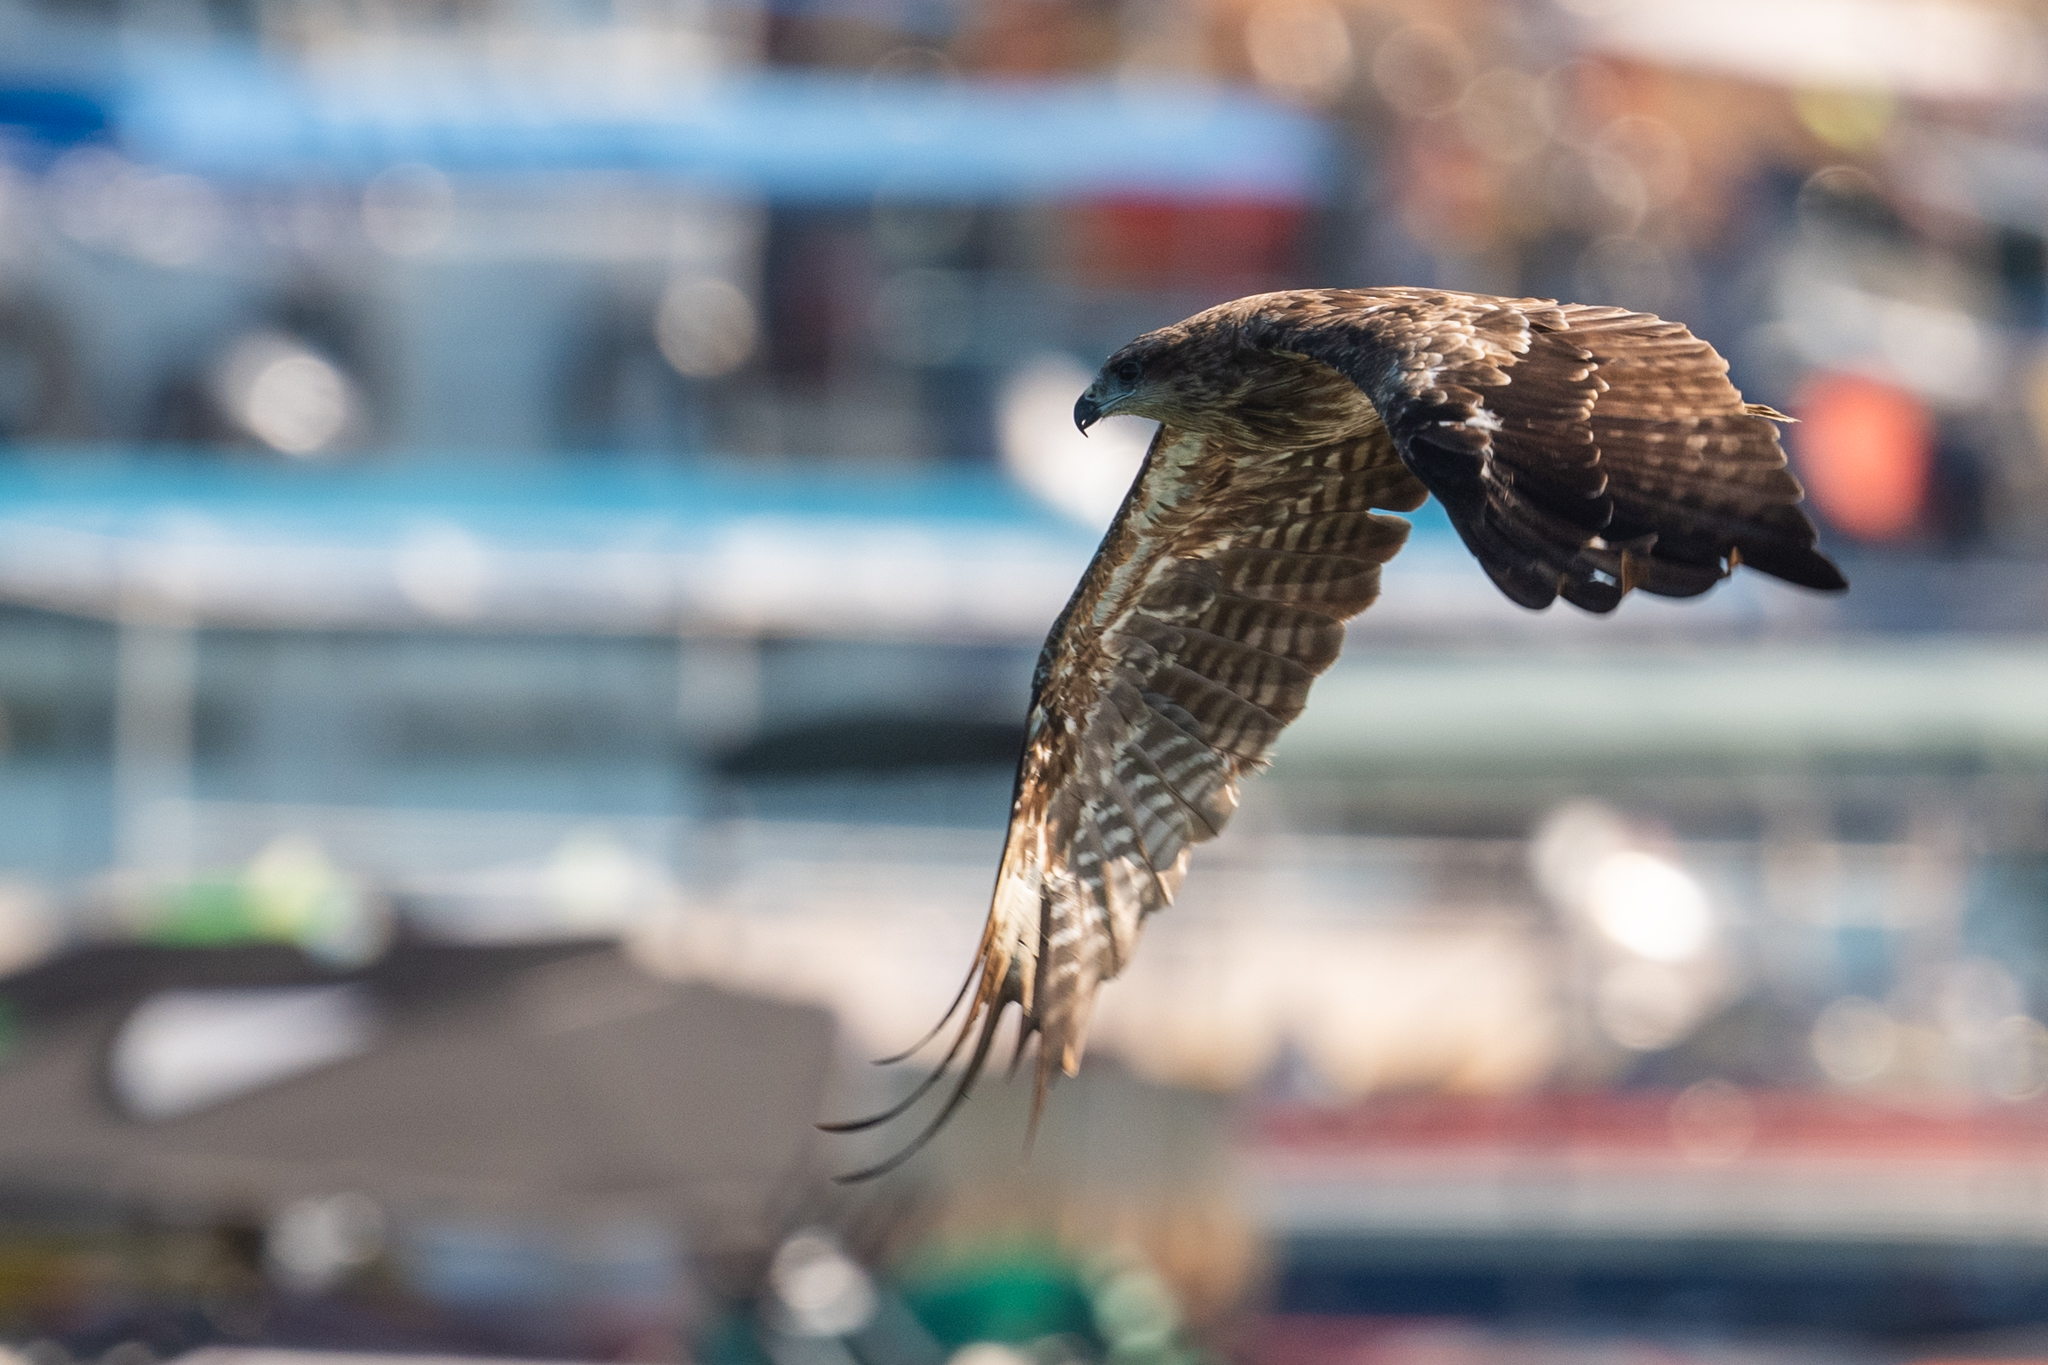 #wildlife #birds #eagle, Chan Benny